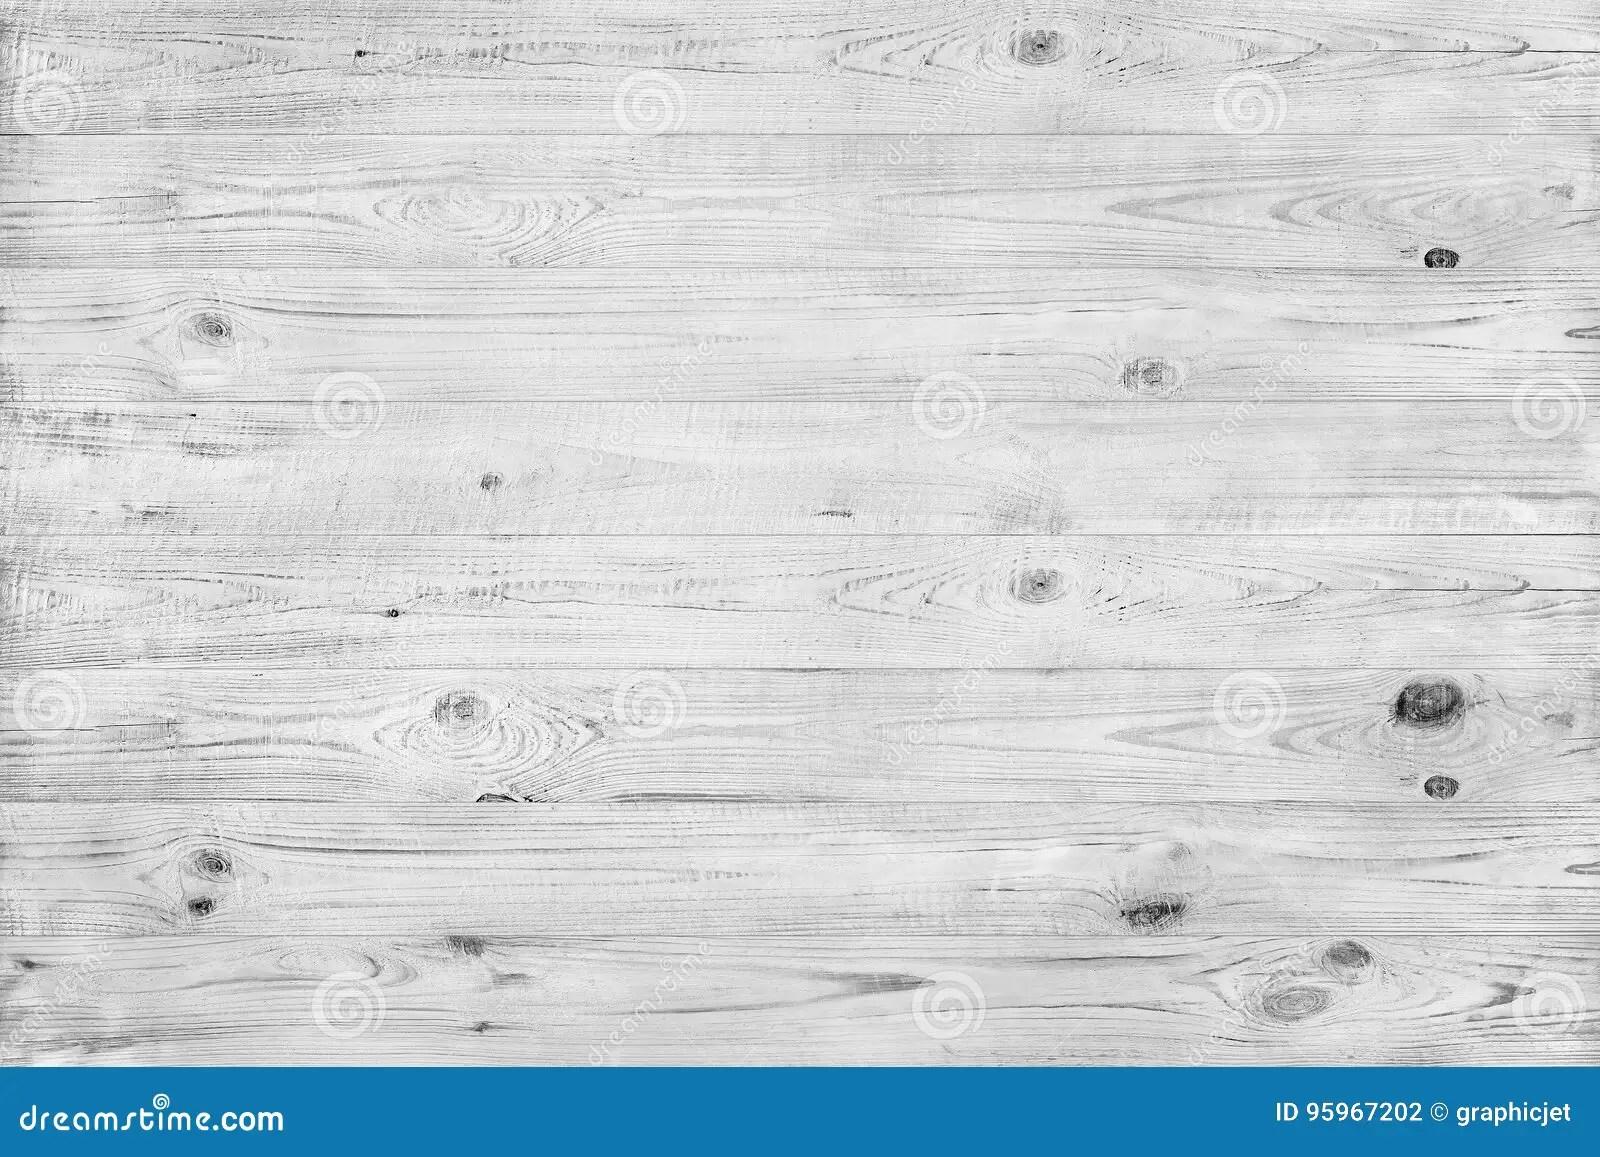 Horizontal Light Wood Texture In Grey Stock Photo